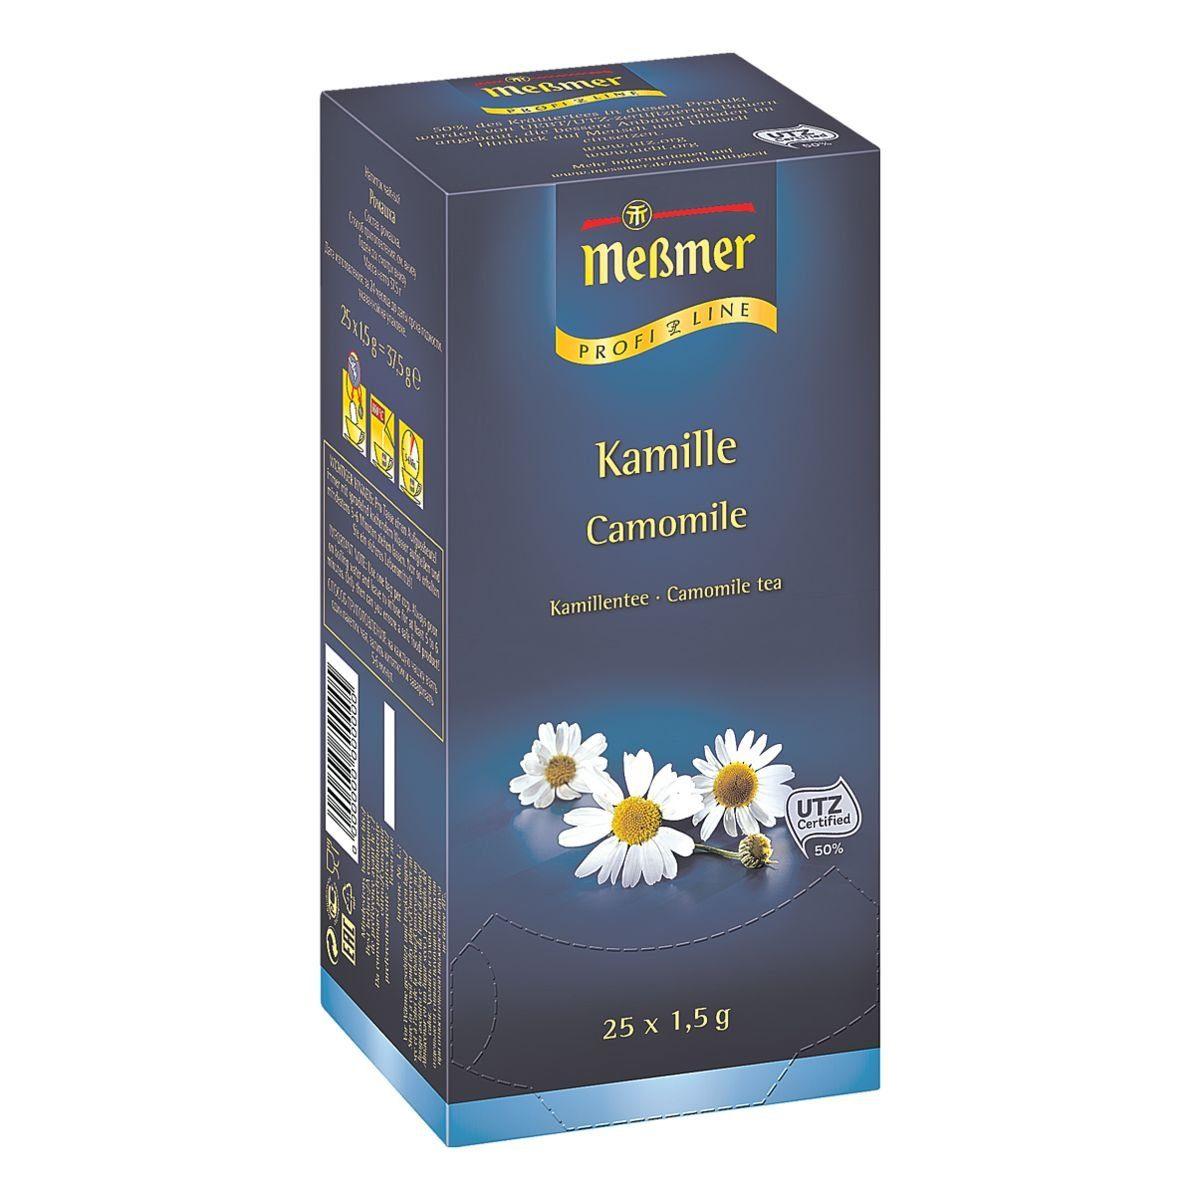 Meßmer Tee »Profi Line Kamille«